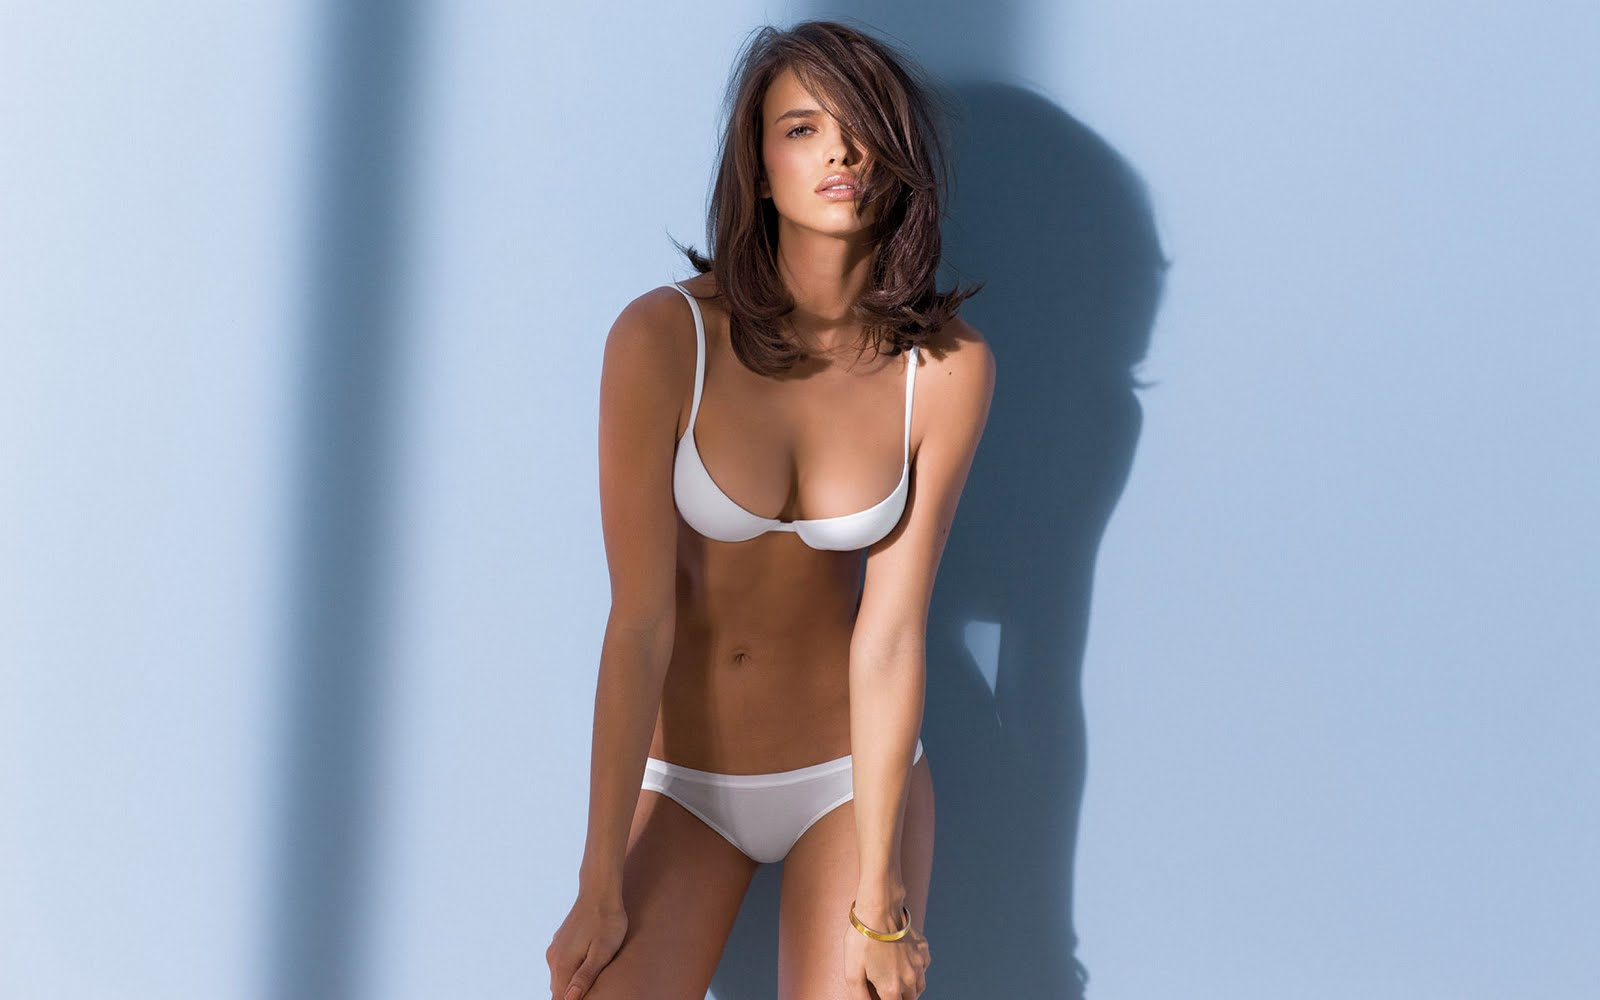 New Hd Wallpapers Very Hot Bikini Wallpapers Of Irina -1016